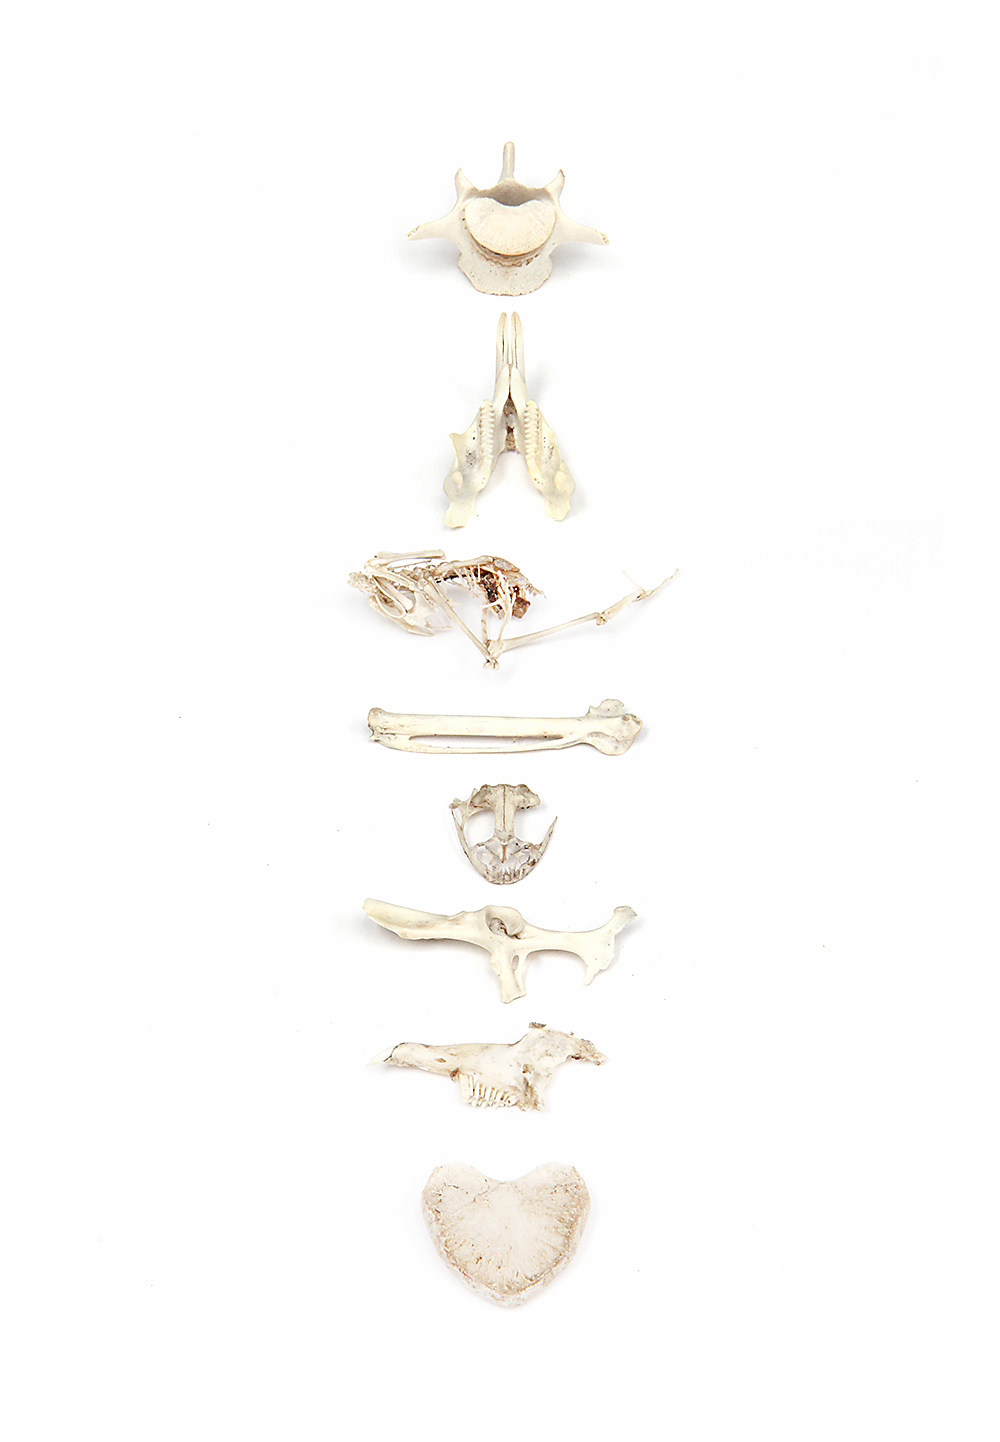 bone-collection-2.jpg